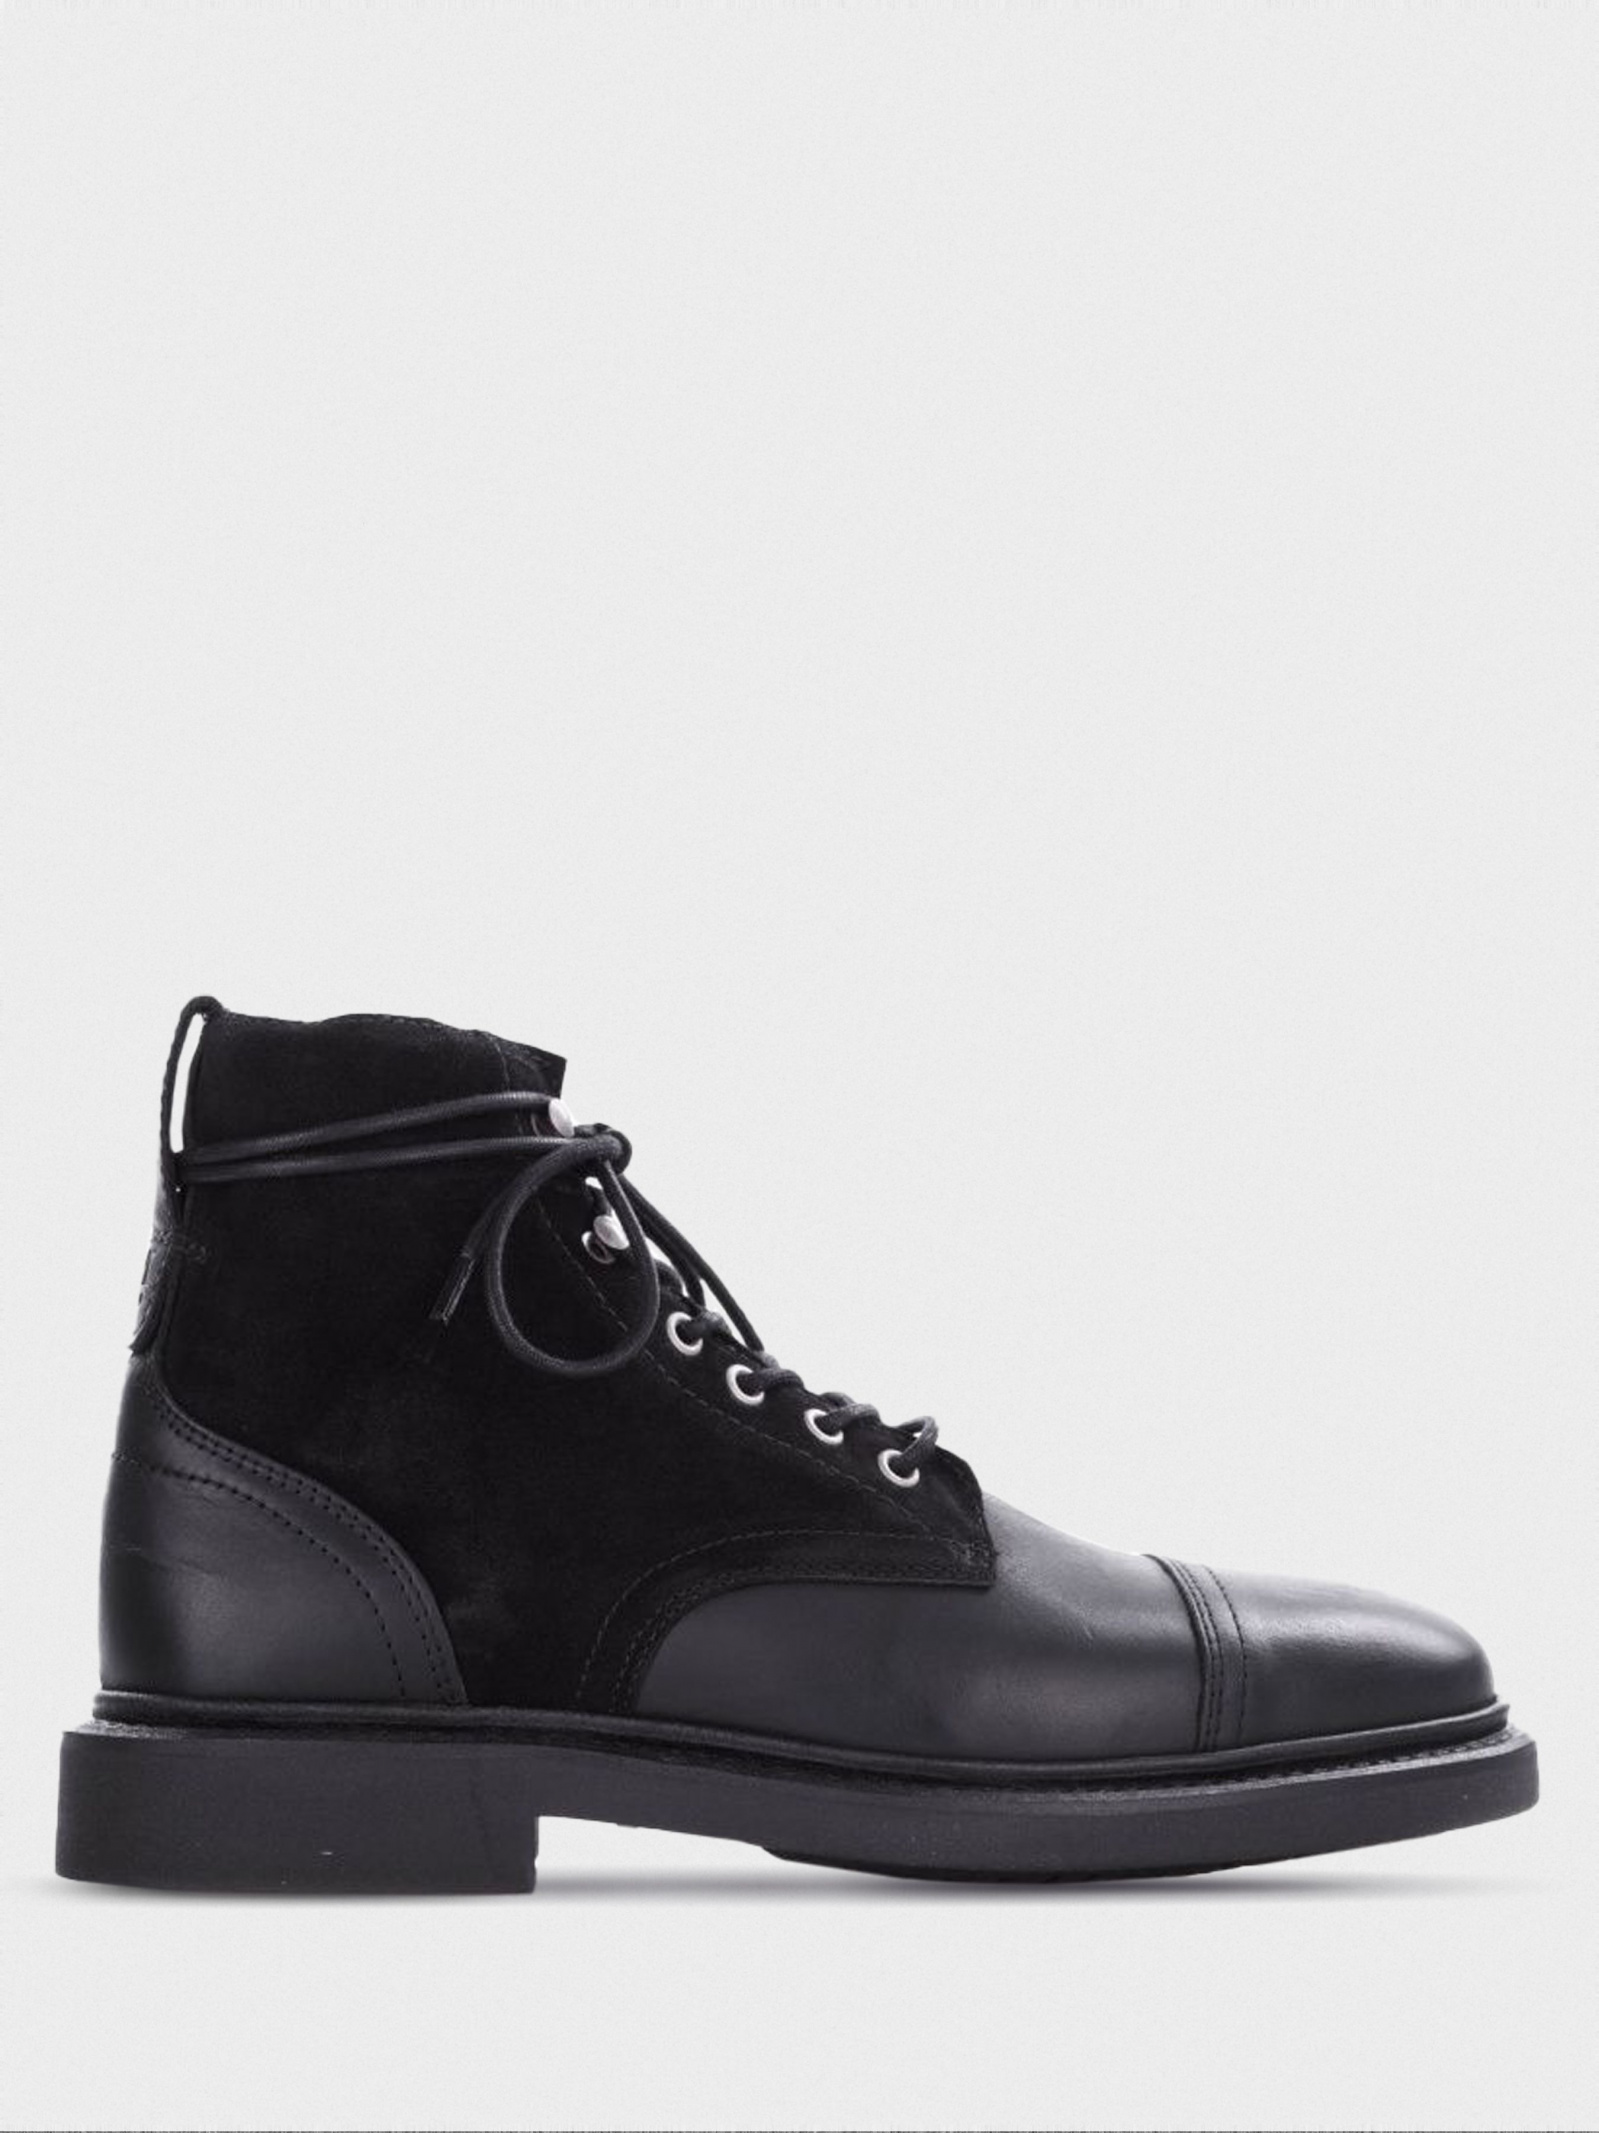 Ботинки мужские MARC O'POLO PO352 размерная сетка обуви, 2017